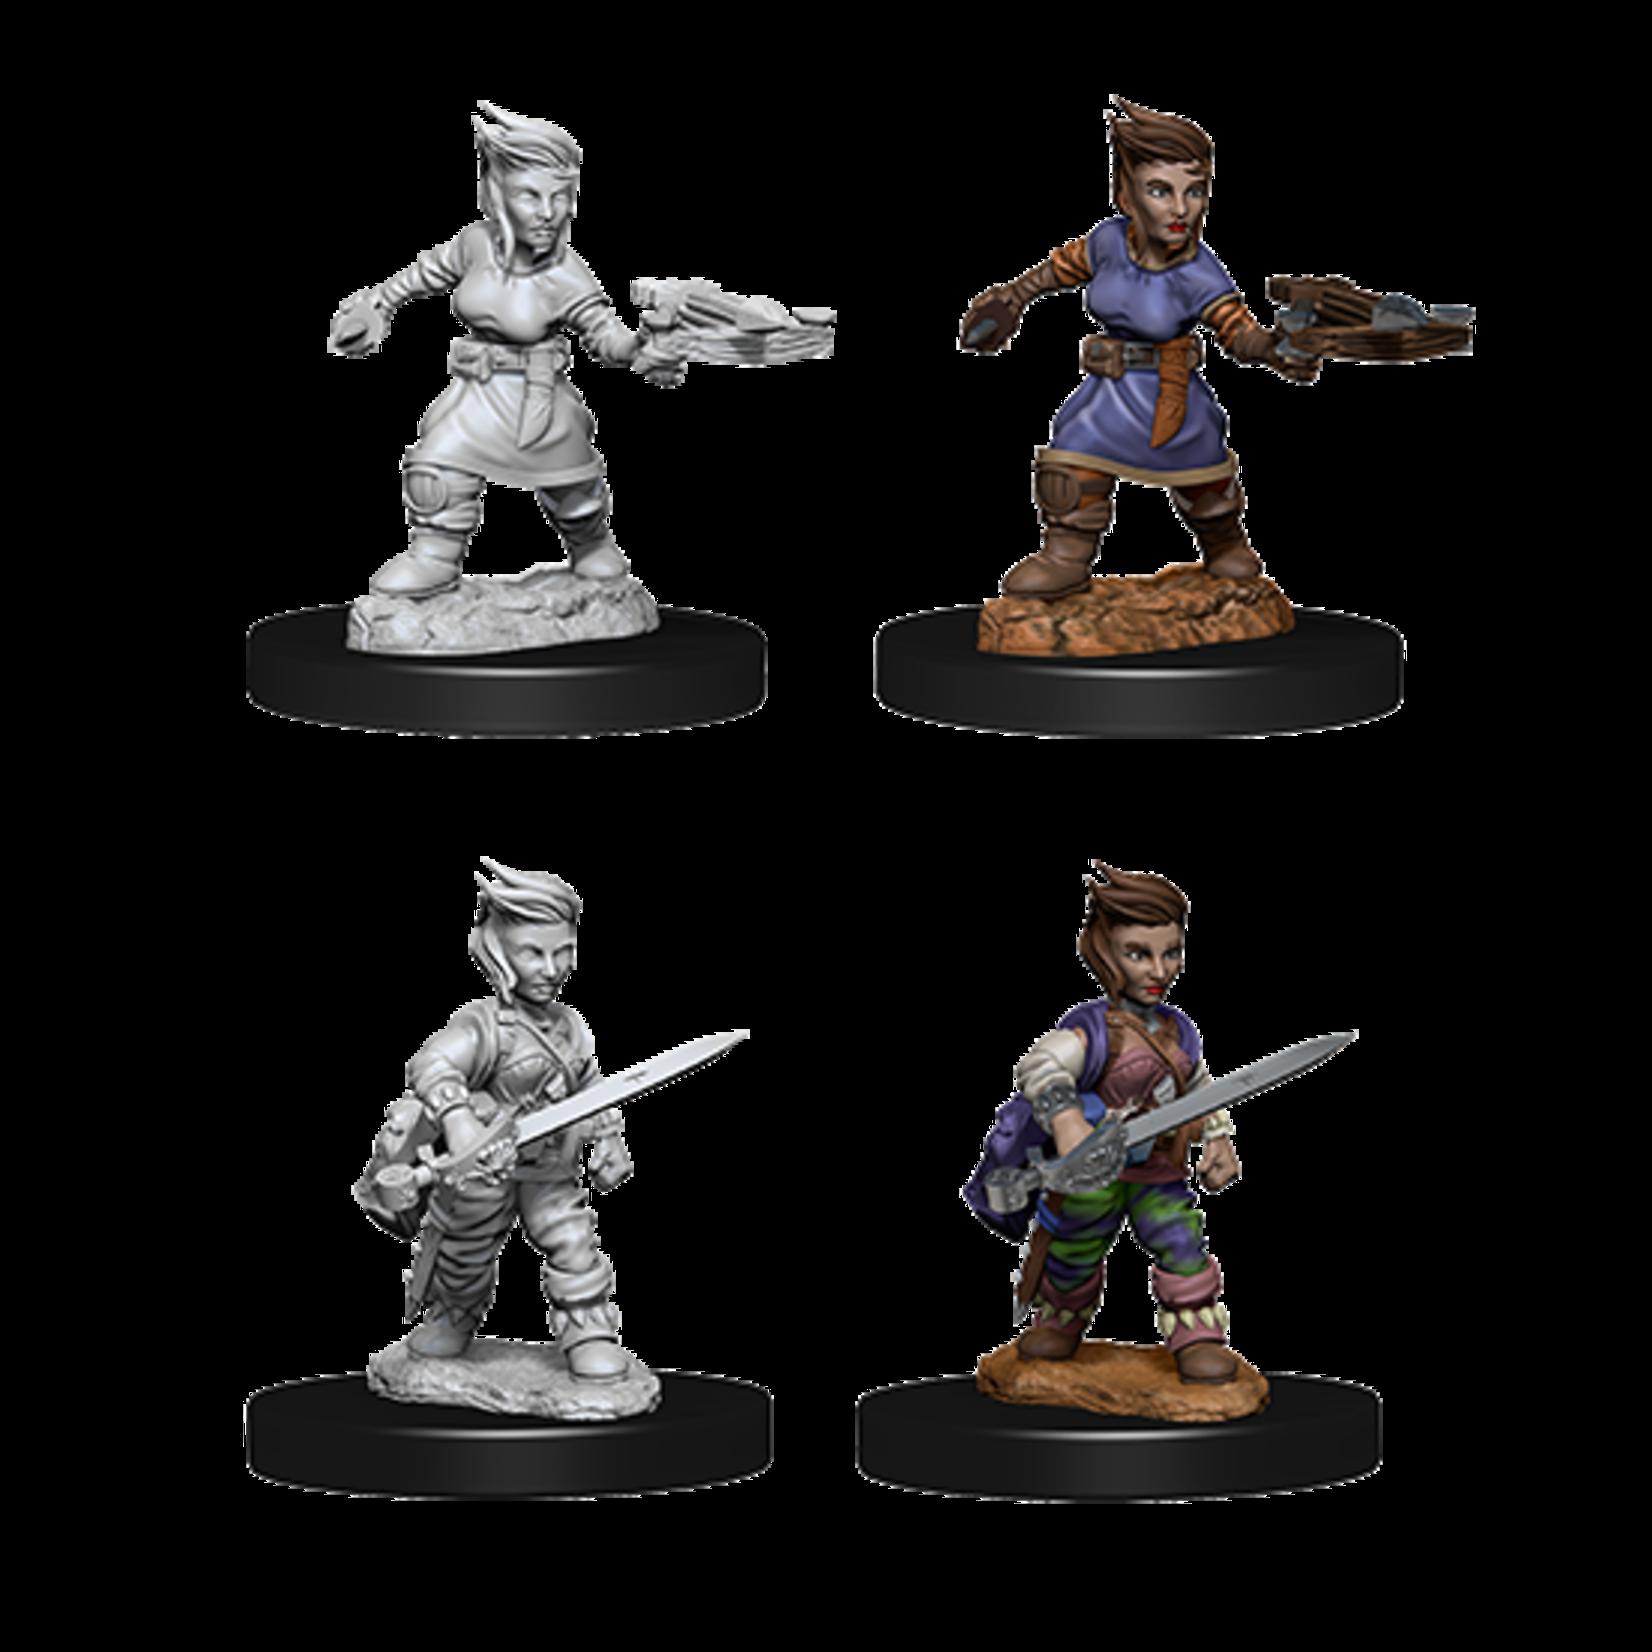 WizKids Pathfinder Battles Deep Cuts Unpainted Miniatures: Halfling Female Rogue (W8)